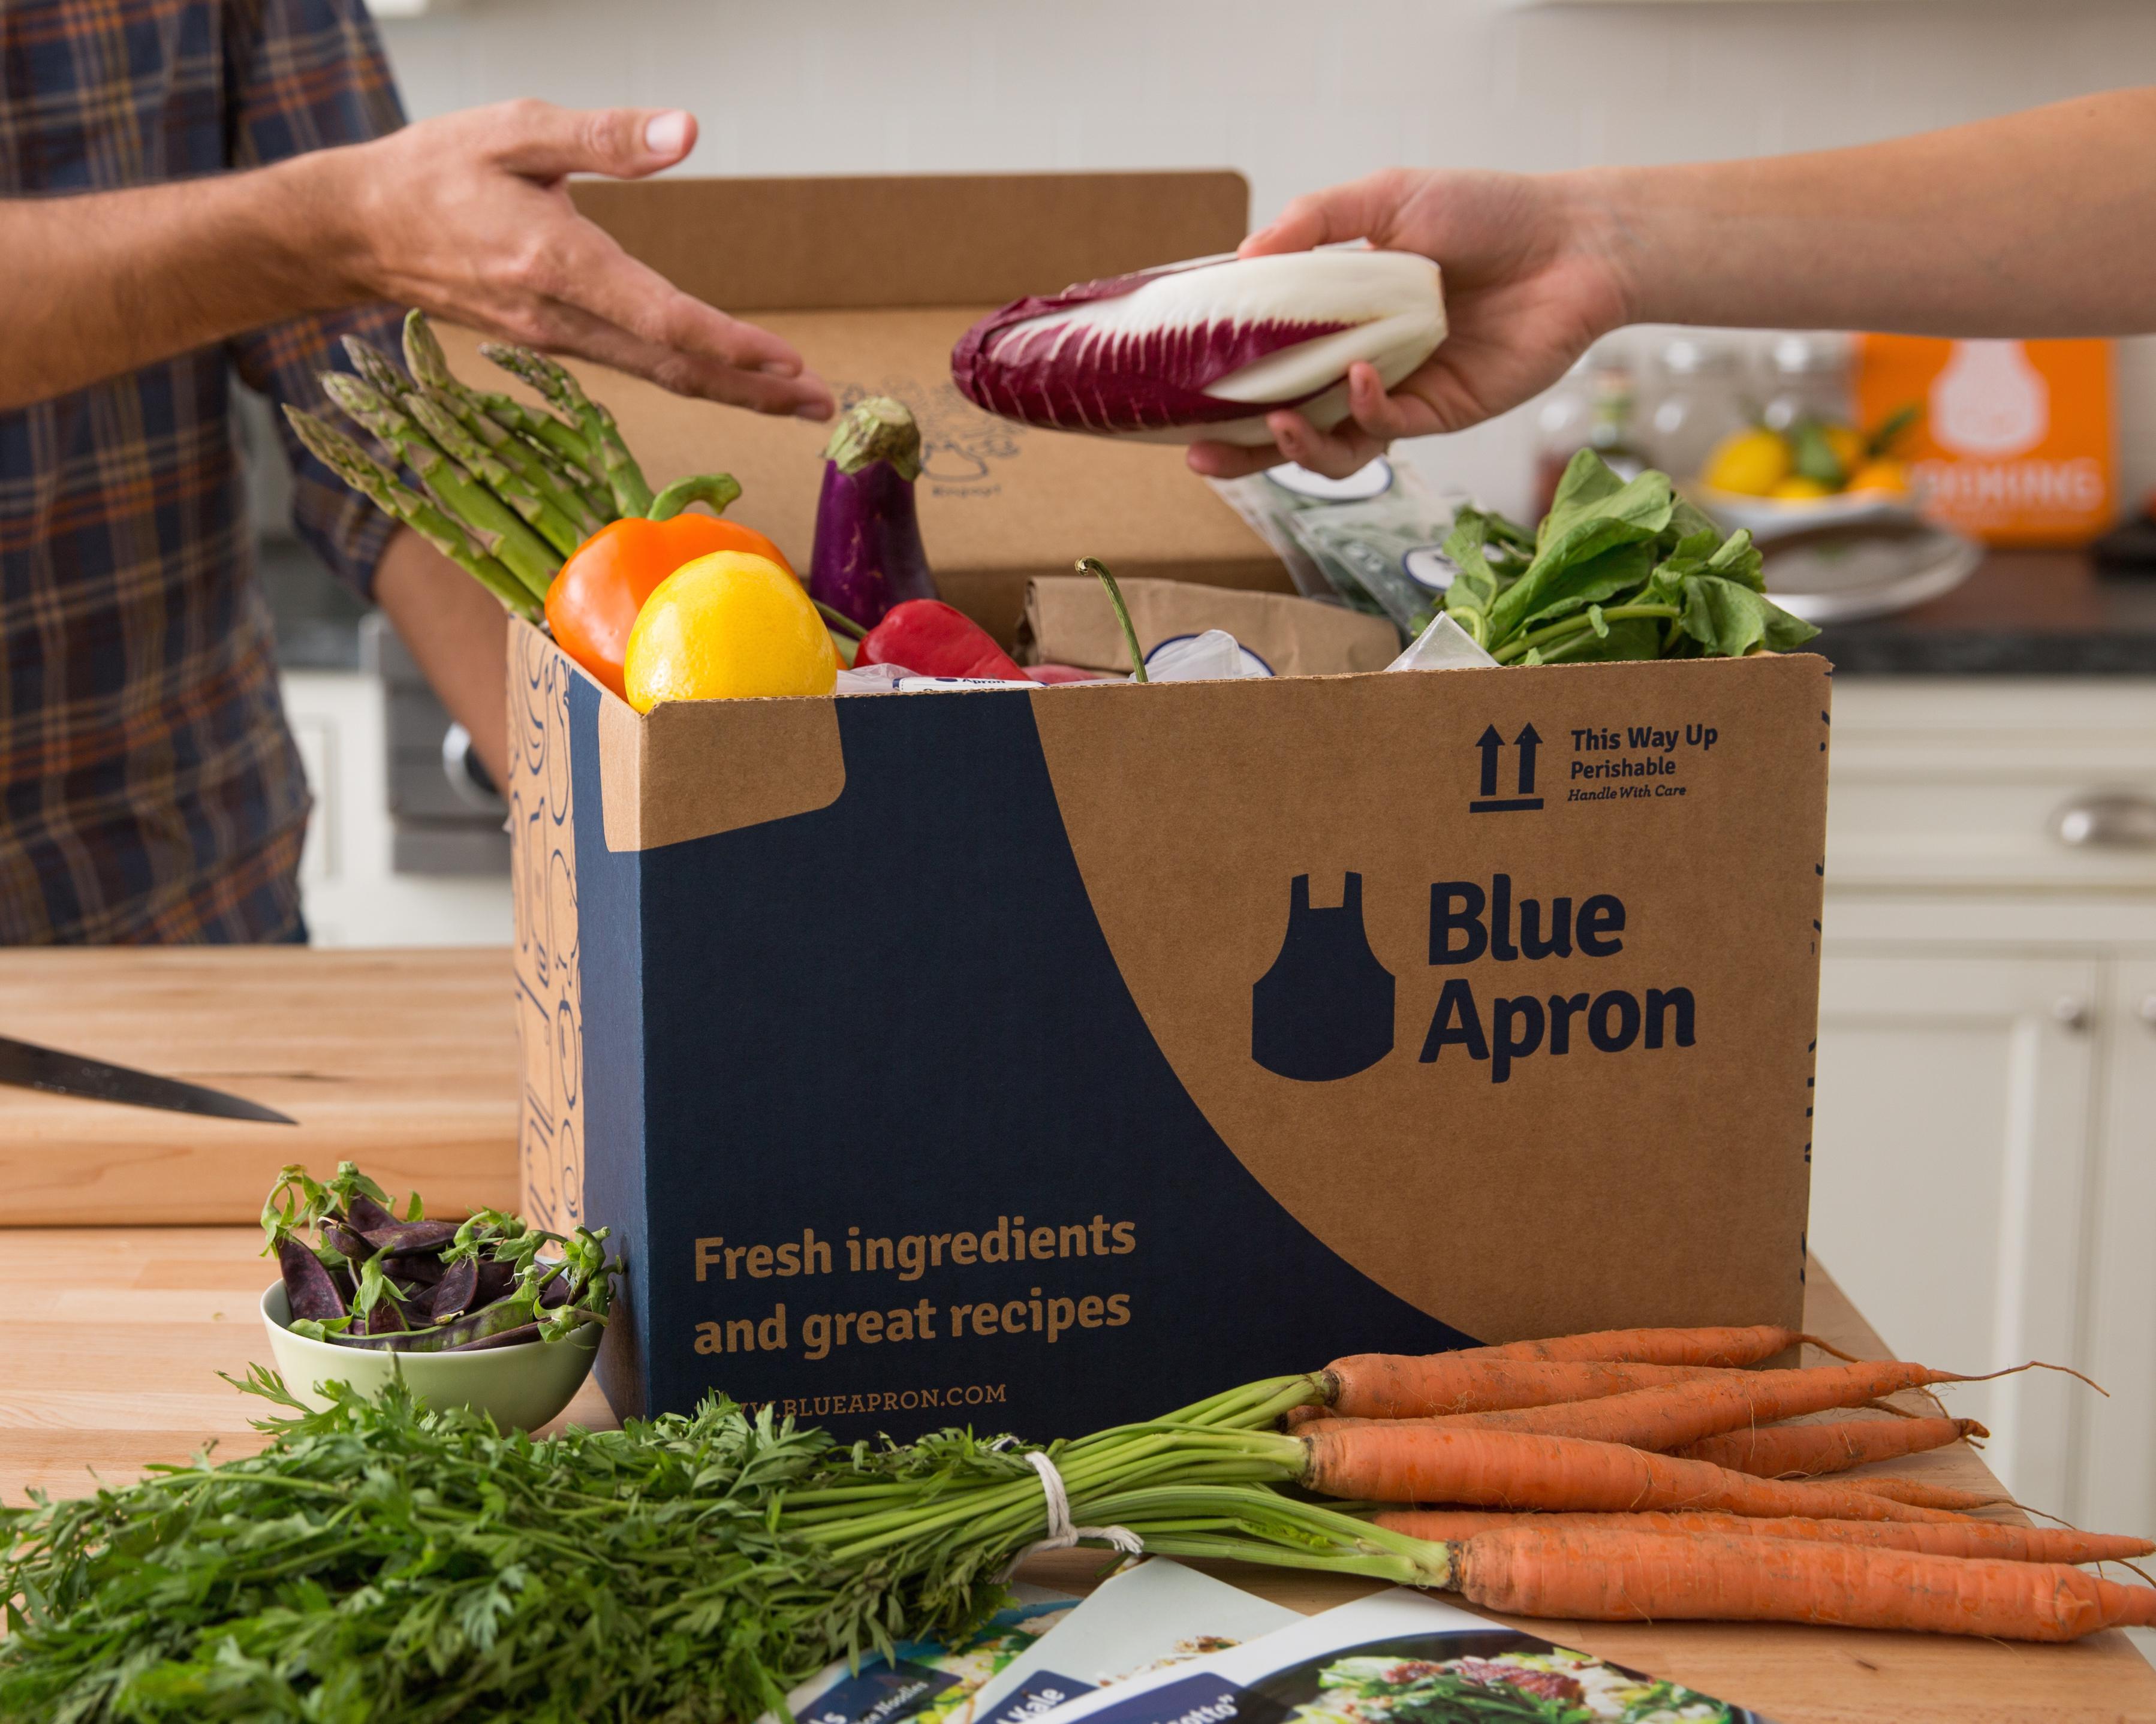 Blue apron pork burgers - Blue Apron Pork Burgers 45